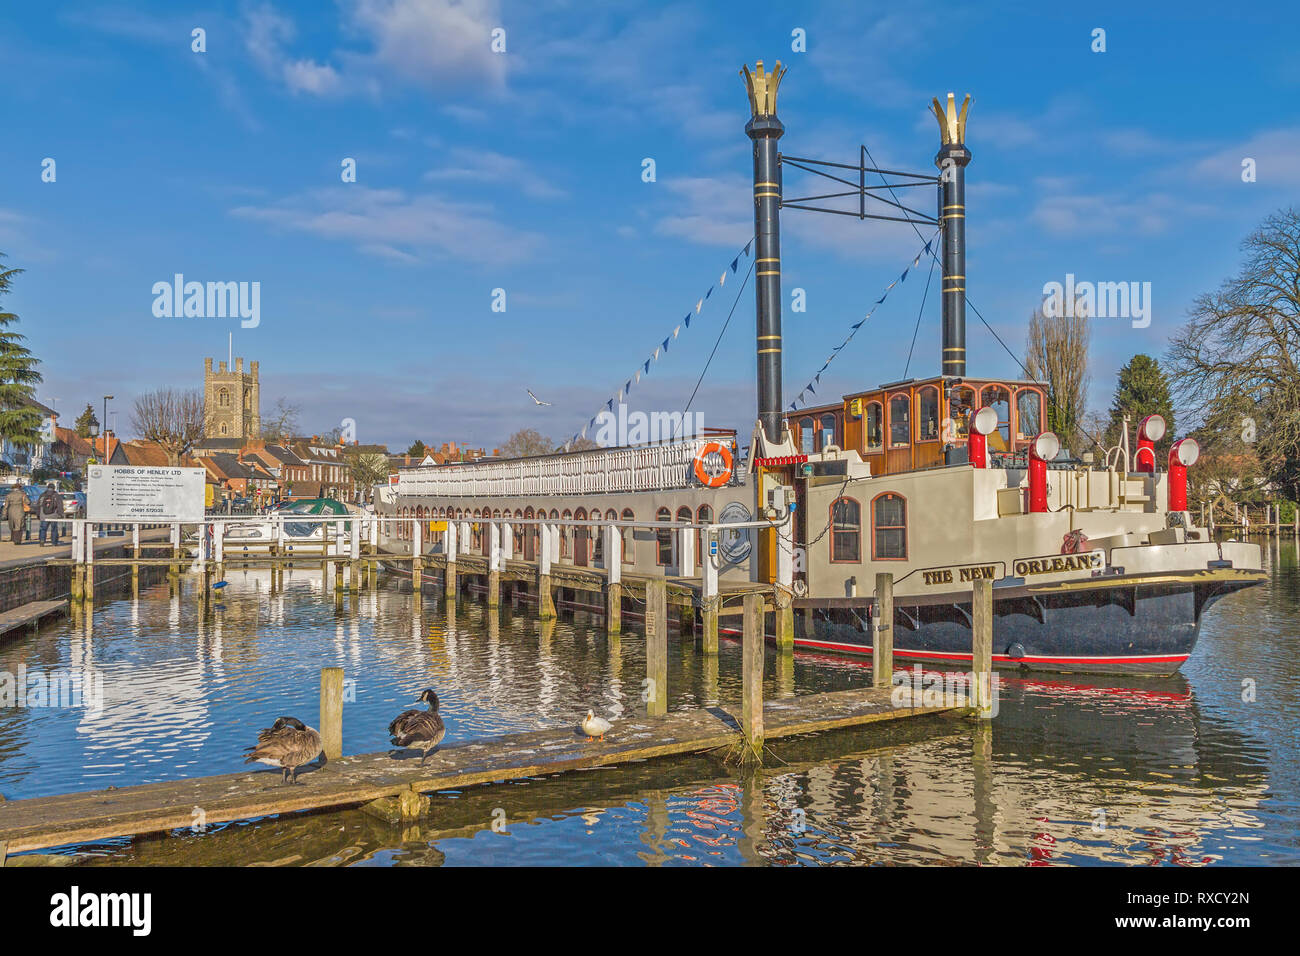 Paddle Steamer New Orleans Henley On Thames UK Stock Photo